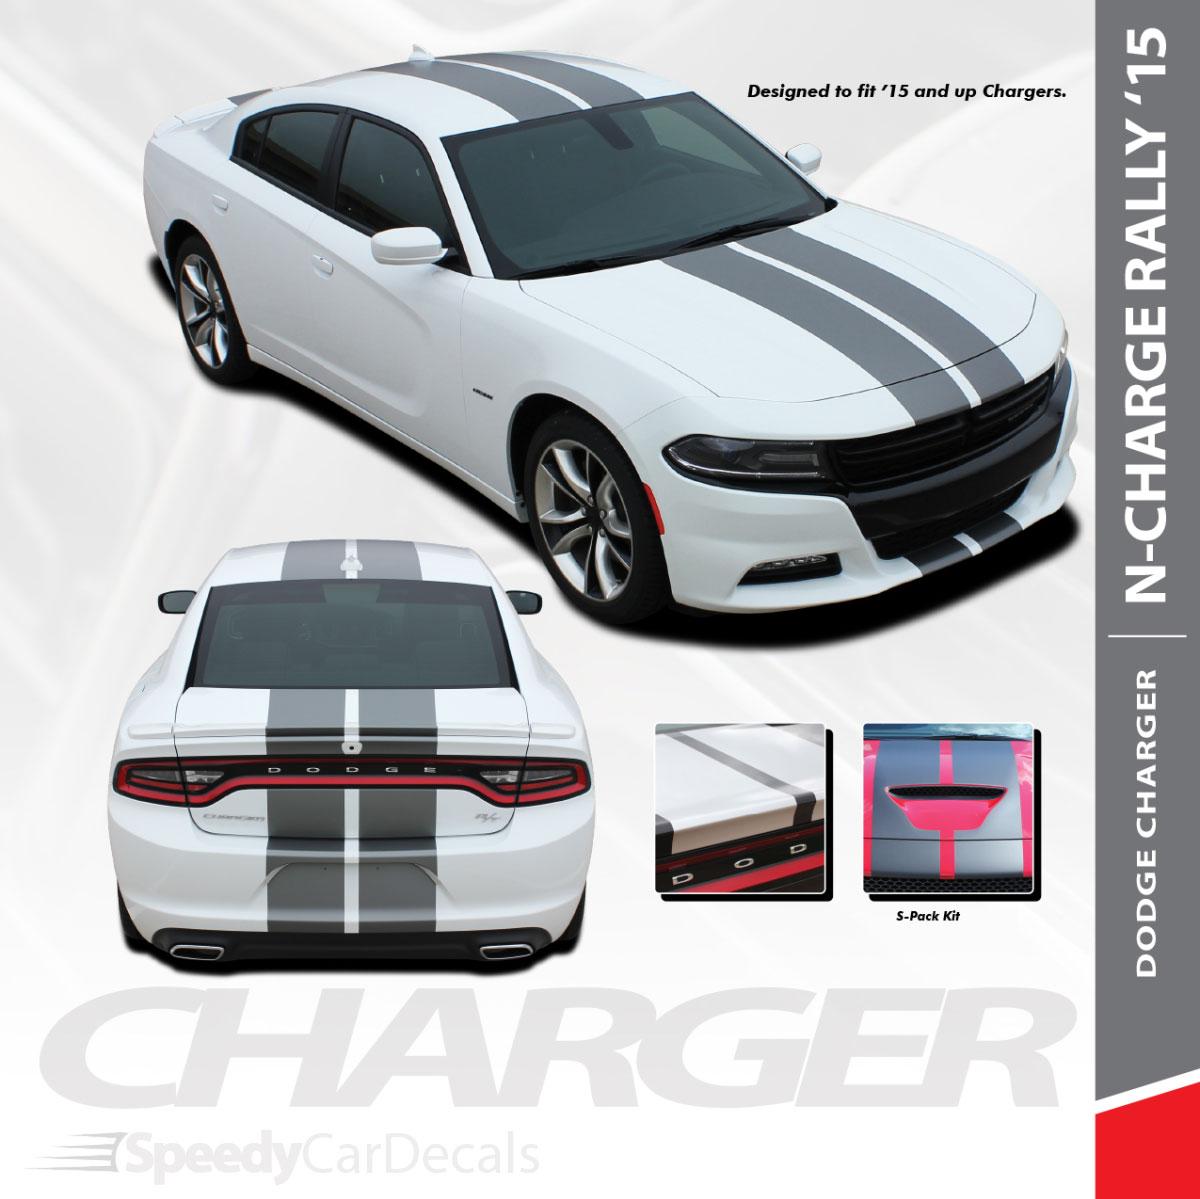 NEW Dodge Charger Intake Hood Decal Daytona SRT Hellcat 392 Scat Pack 2015-2018